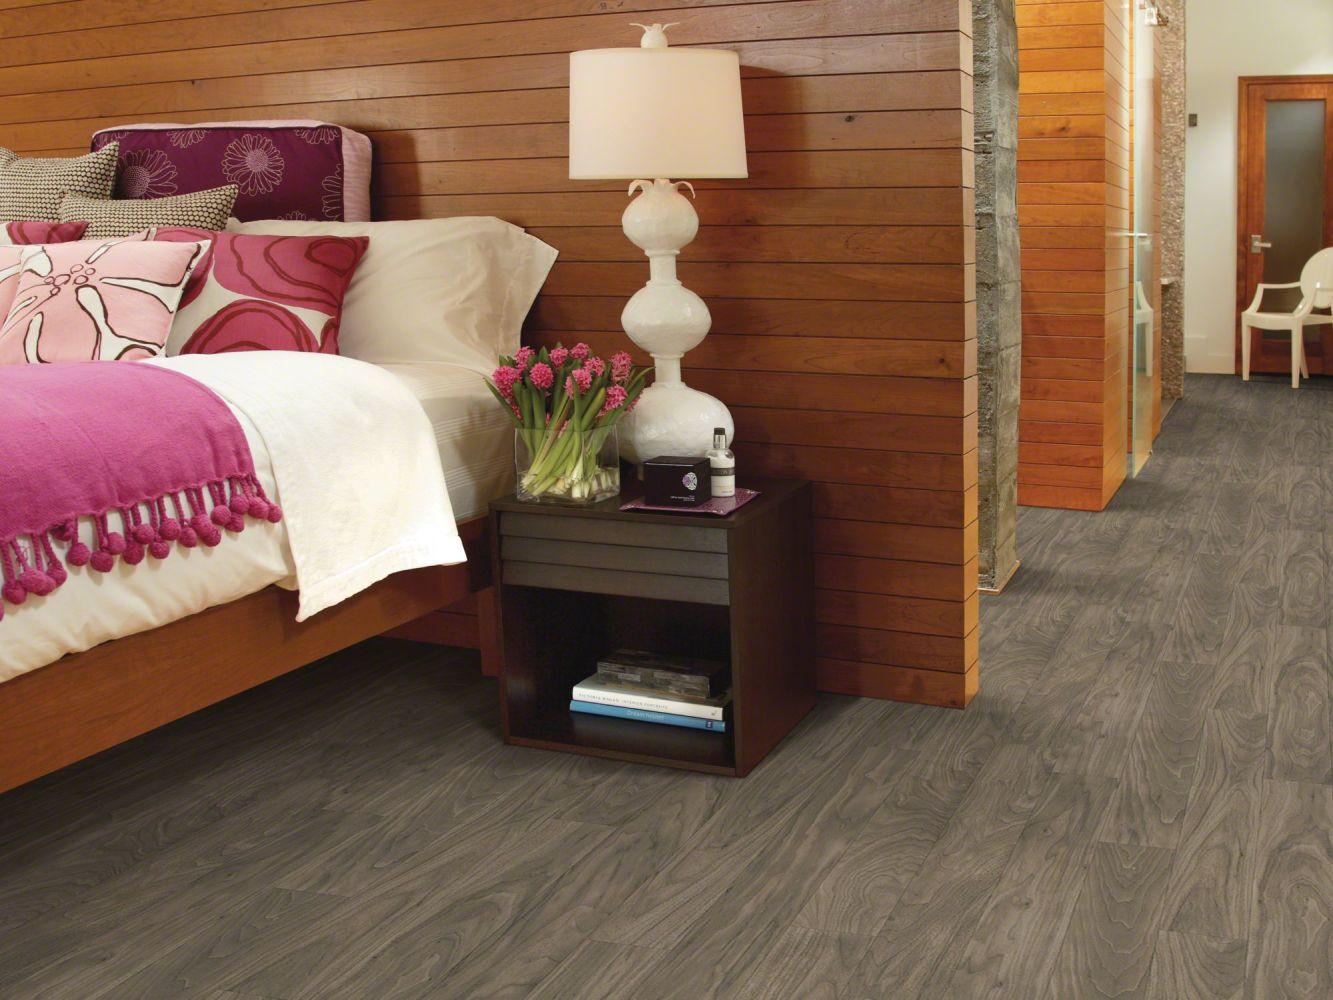 Shaw Floors Resilient Residential Prometheus Corinthia 00521_0612V